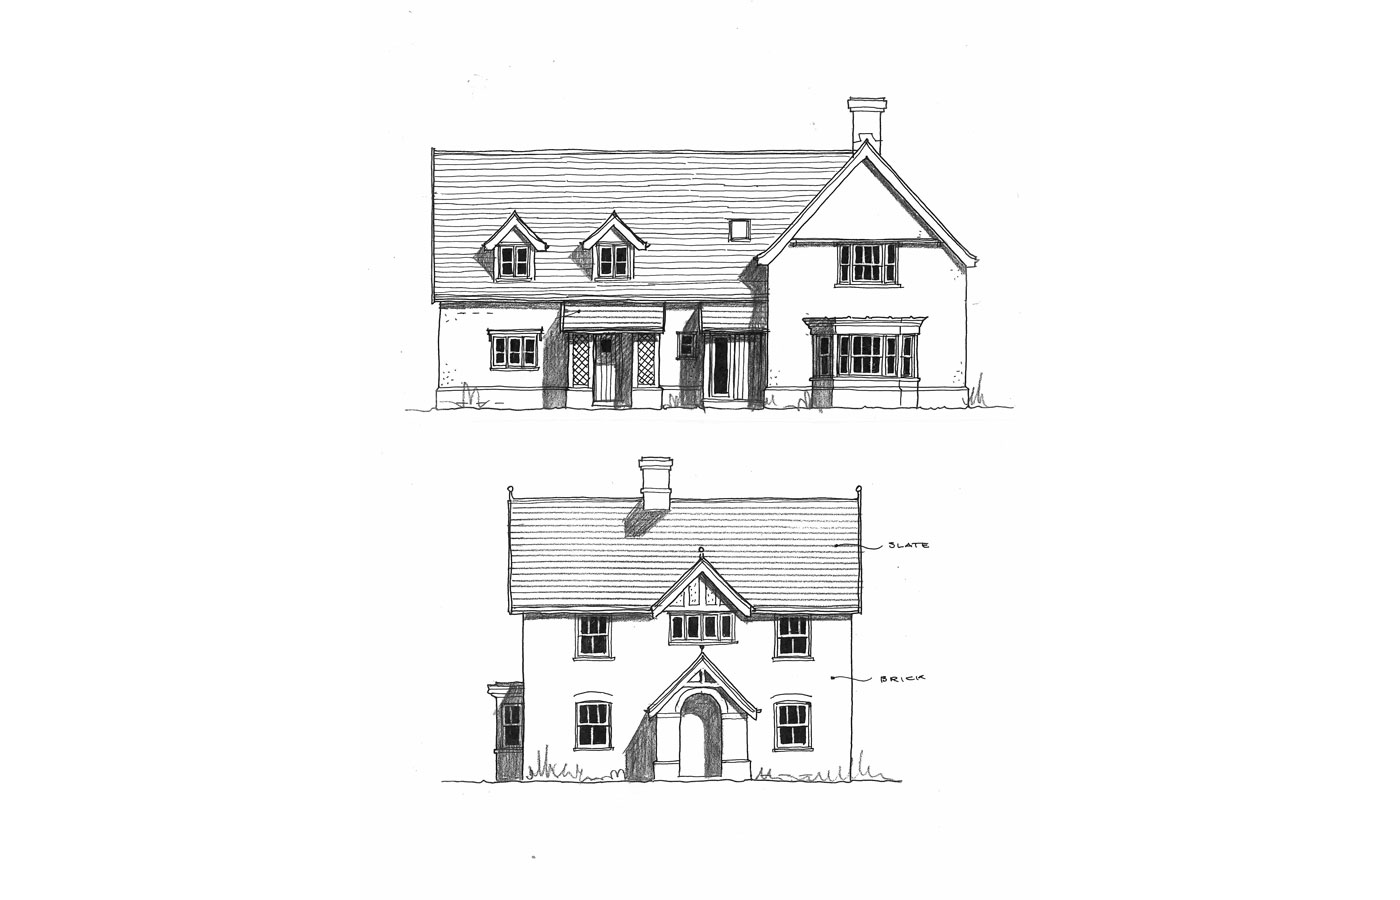 New Housing Project Designs - Wickhambrook